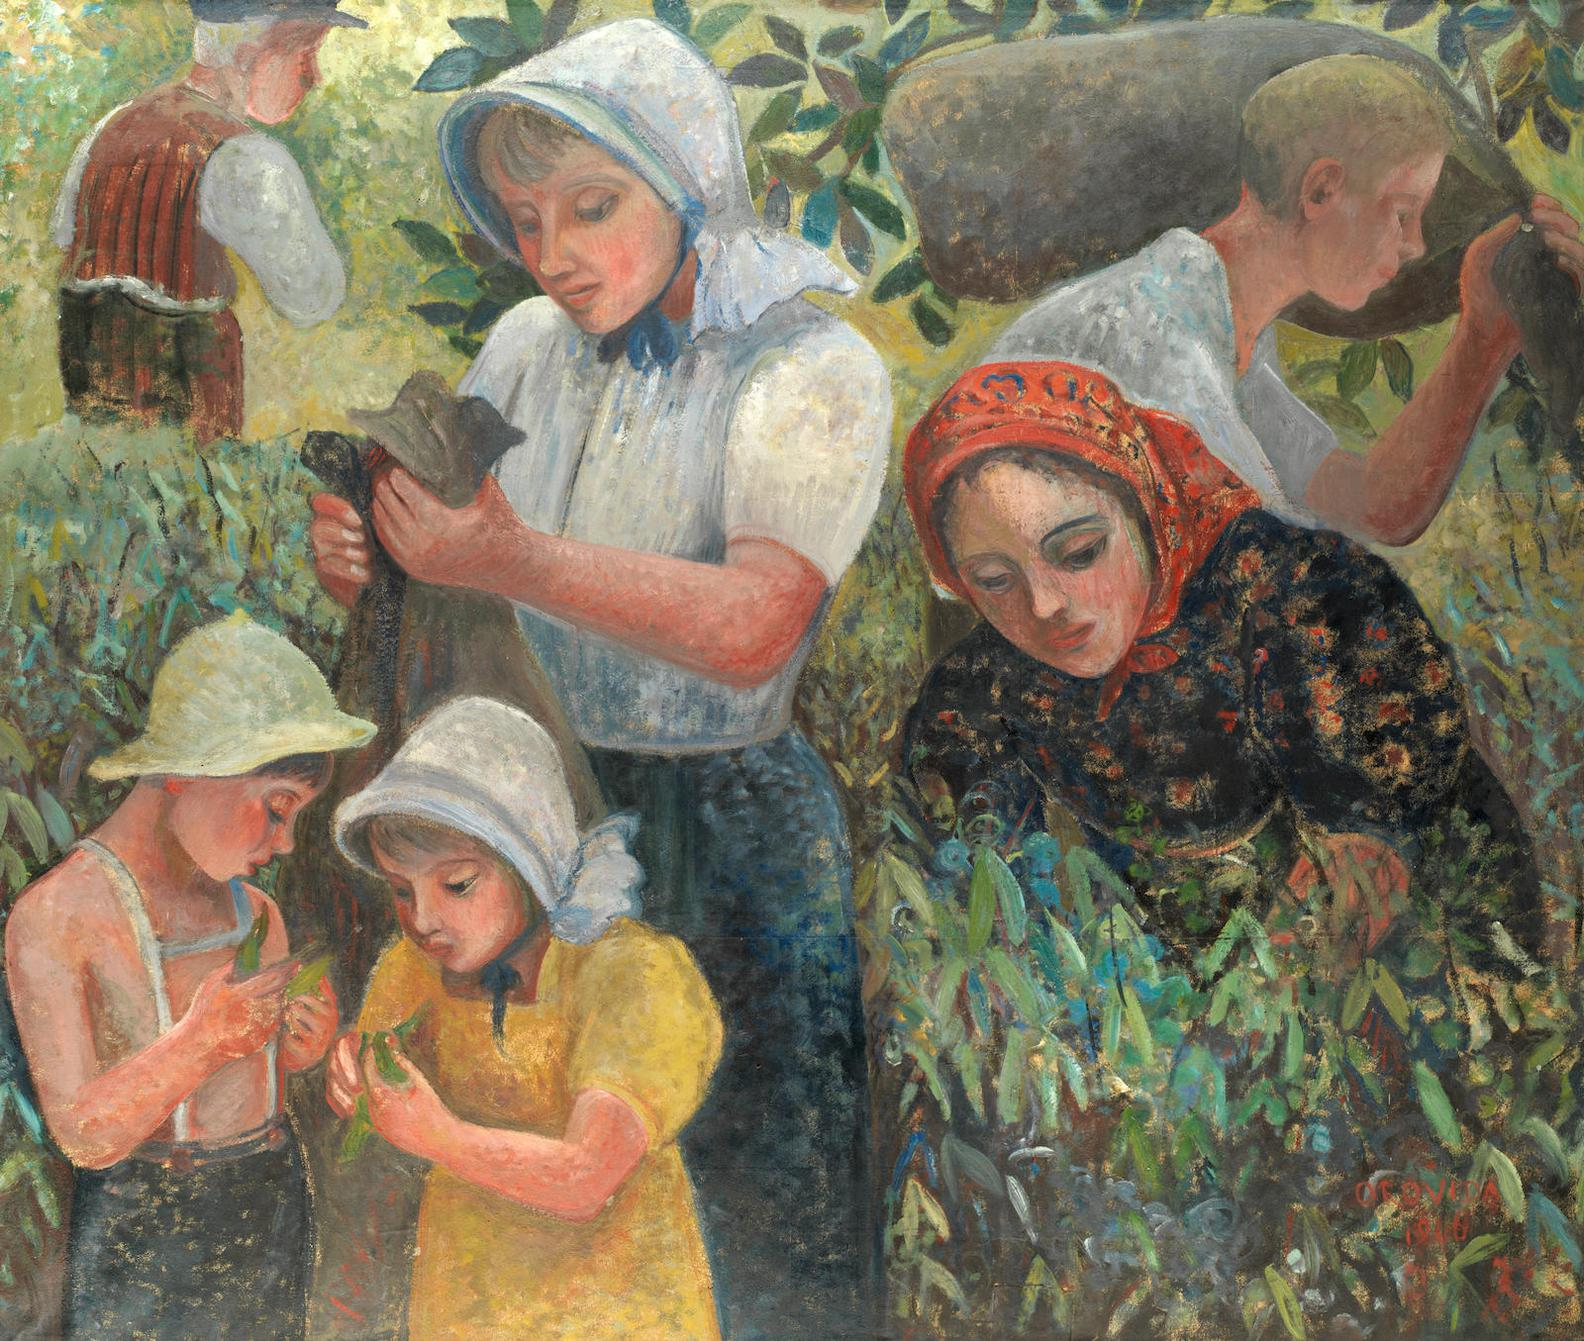 Orovida Camille Pissarro - Summer - Picking Peas-1946